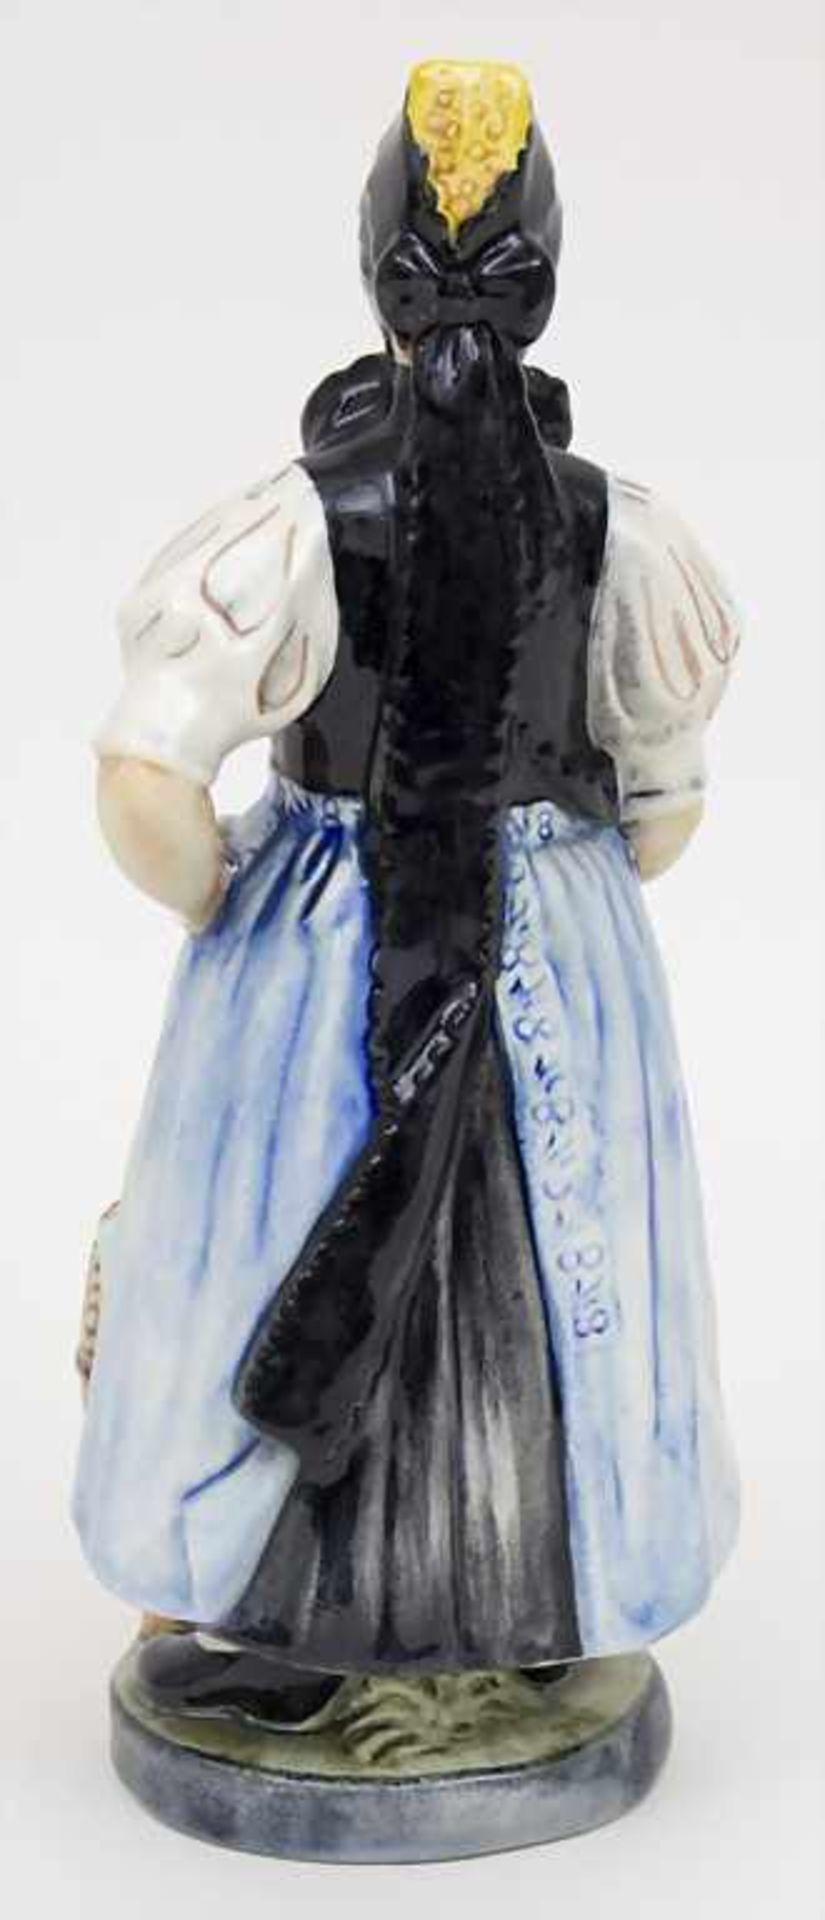 Trachtenfigur 'Tribergerin' / A costumed woman from the Black Forest, Karlsruher Majolika, um 1940 - Bild 2 aus 4